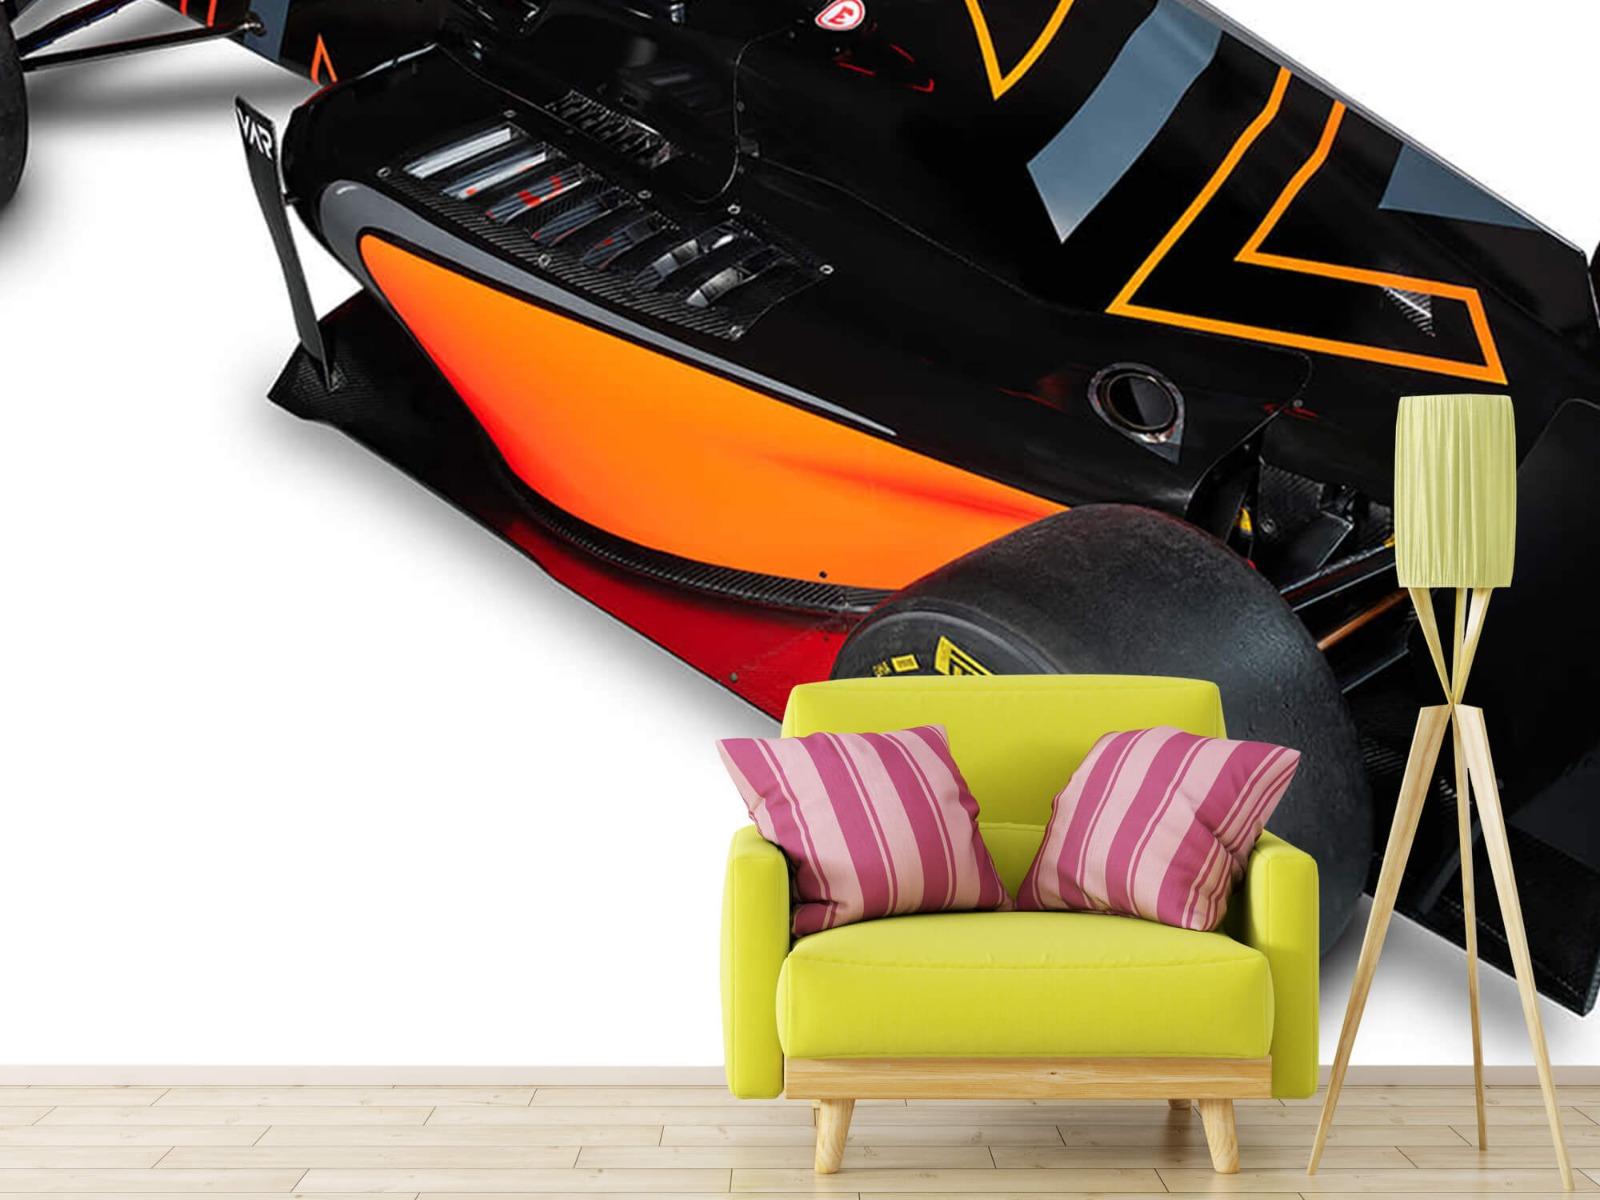 Sportauto's - Formula 3 - Rear left view - Hobbykamer 17